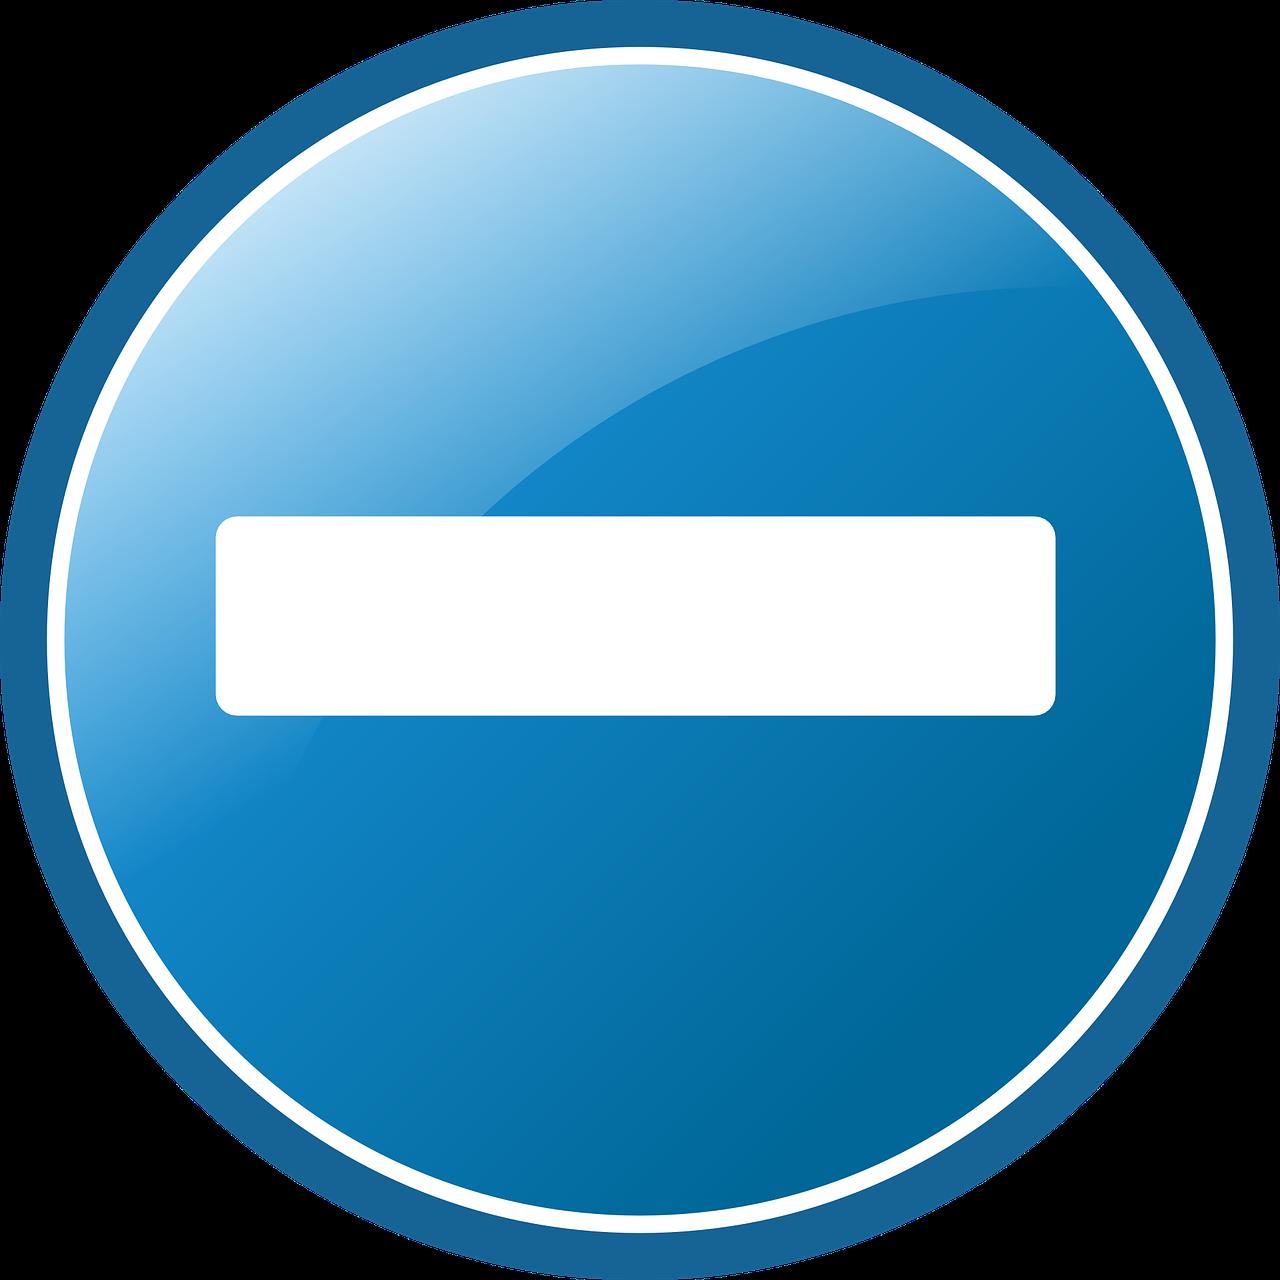 Знак минус картинка